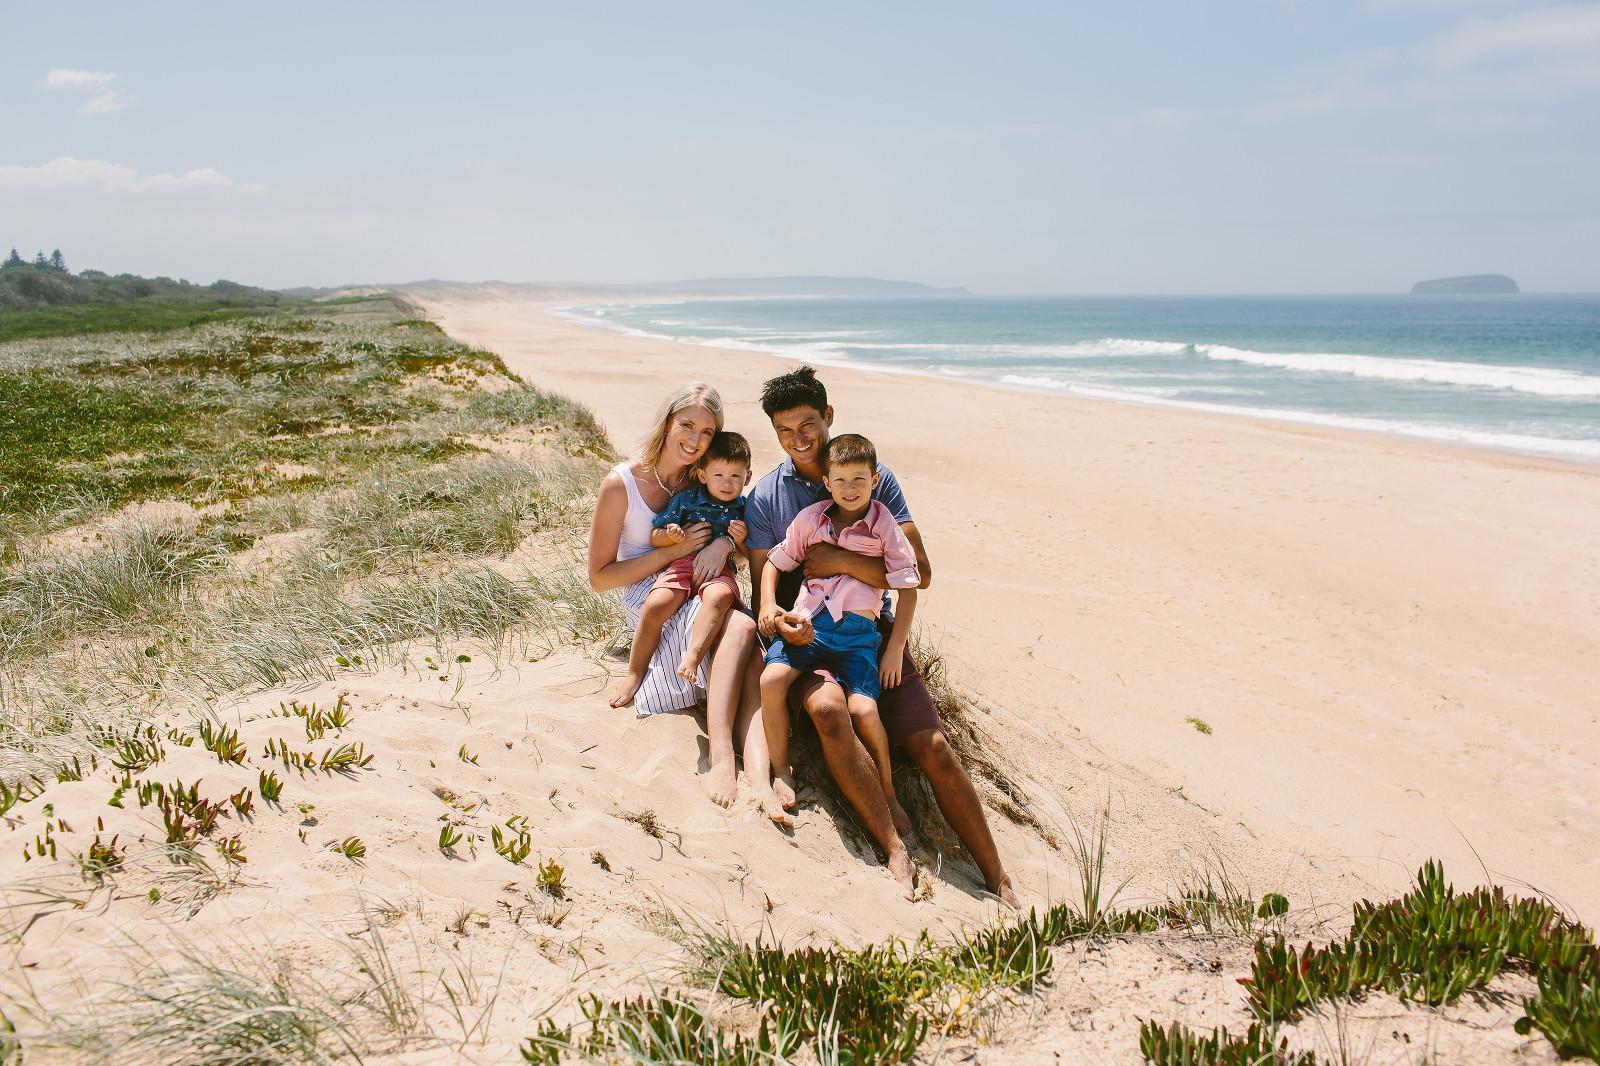 Cavanagh Photography Family photography